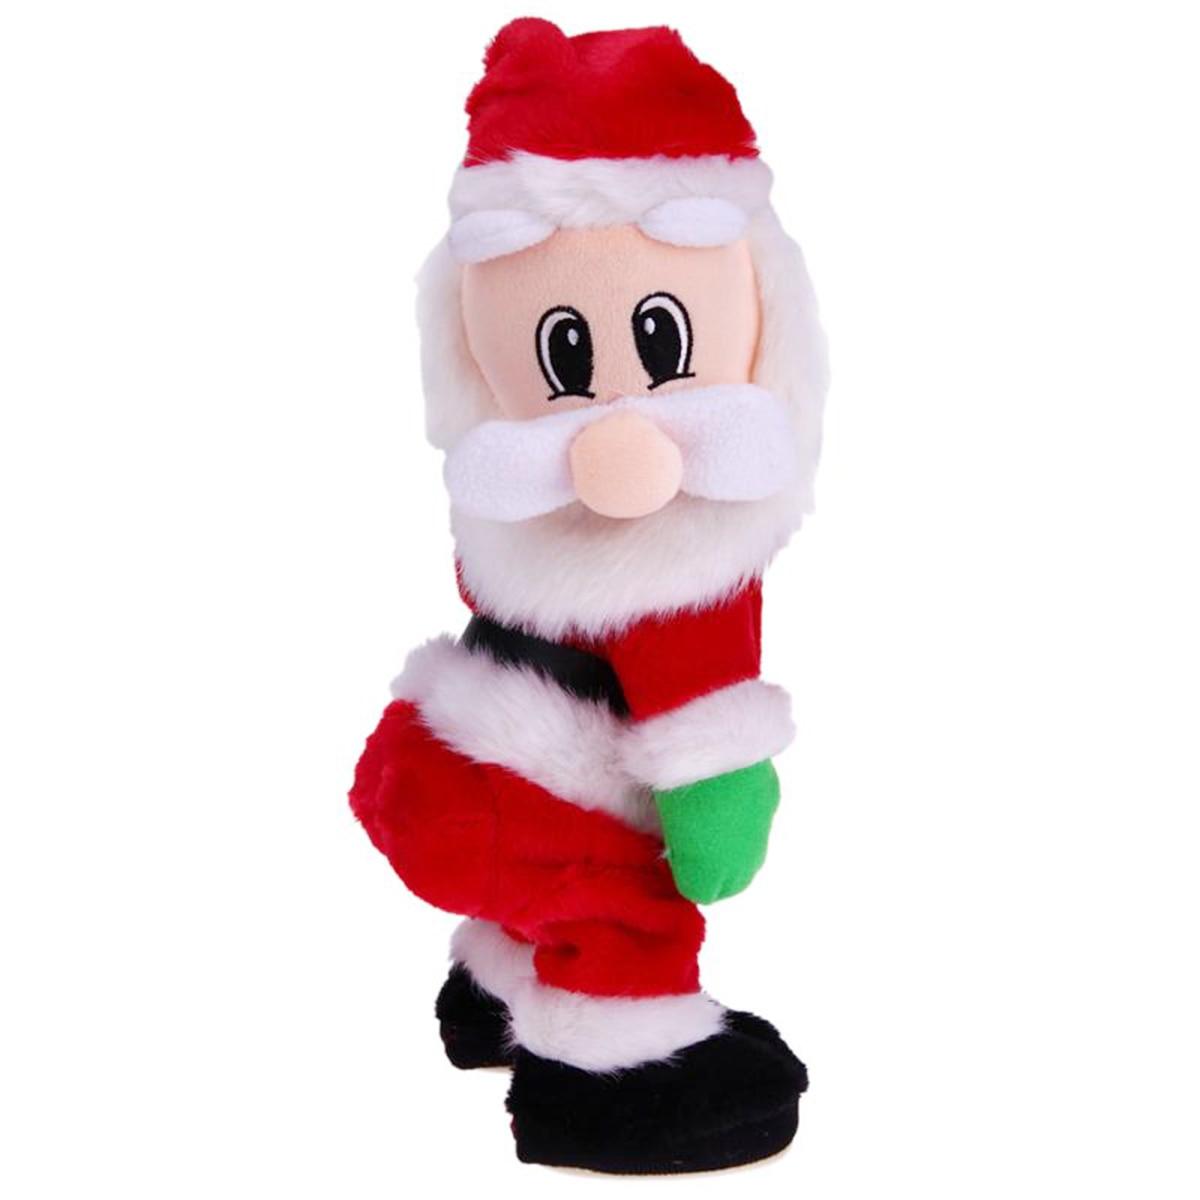 MAGICYOYO New Christmas Gift Dancing Electric Musical Toy Santa Claus Twerking  Singing Doll